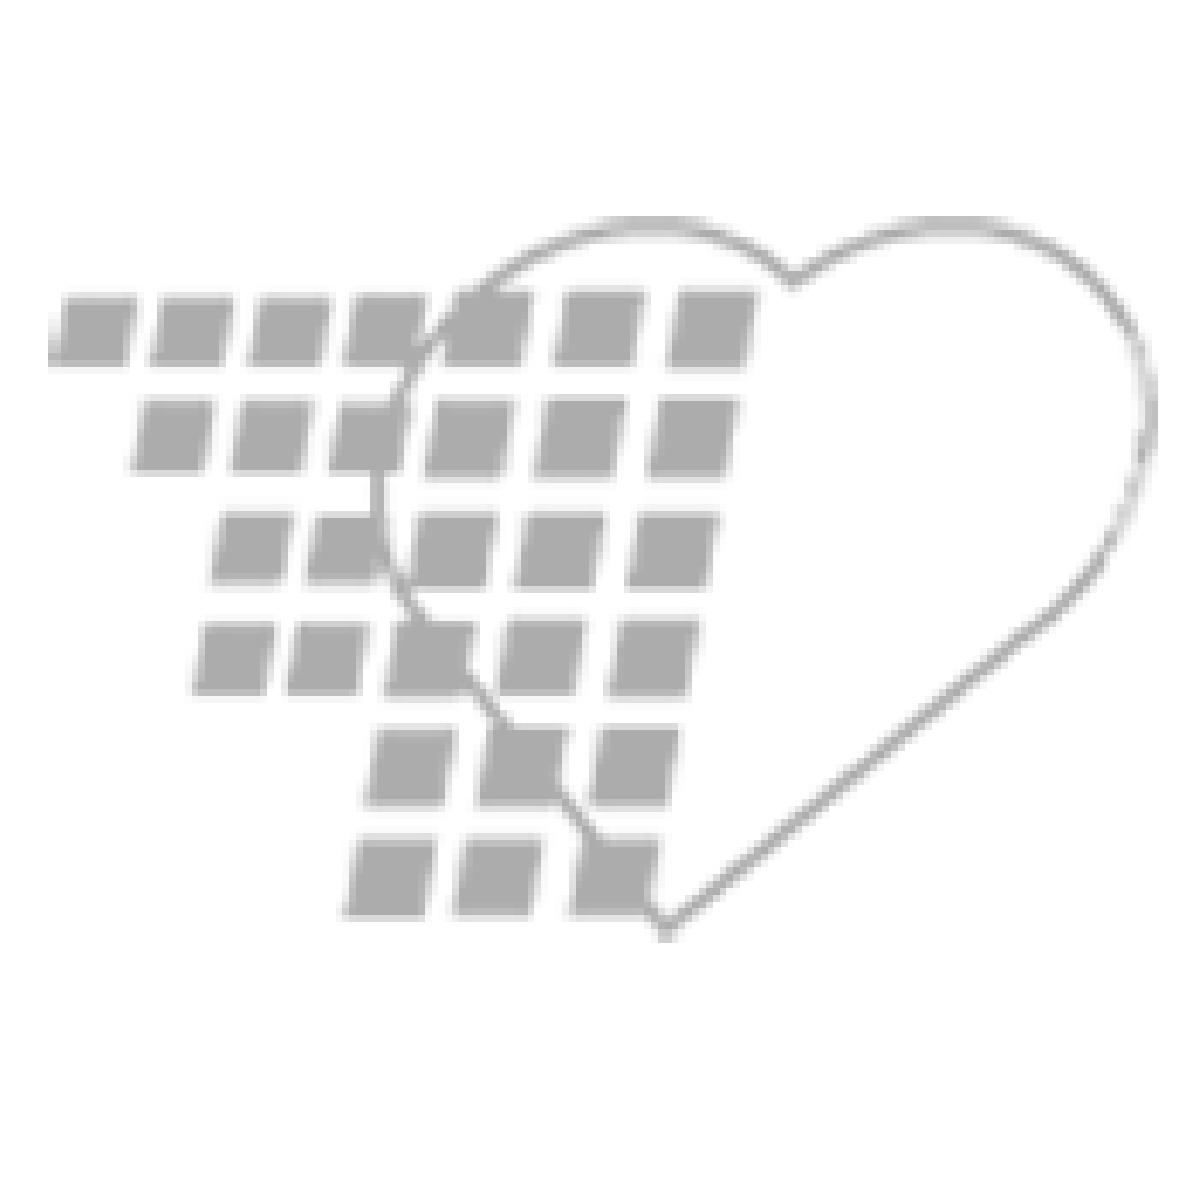 06-93-0414 Demo Dose® Sodim Acetat 2mEq/mL 50mL